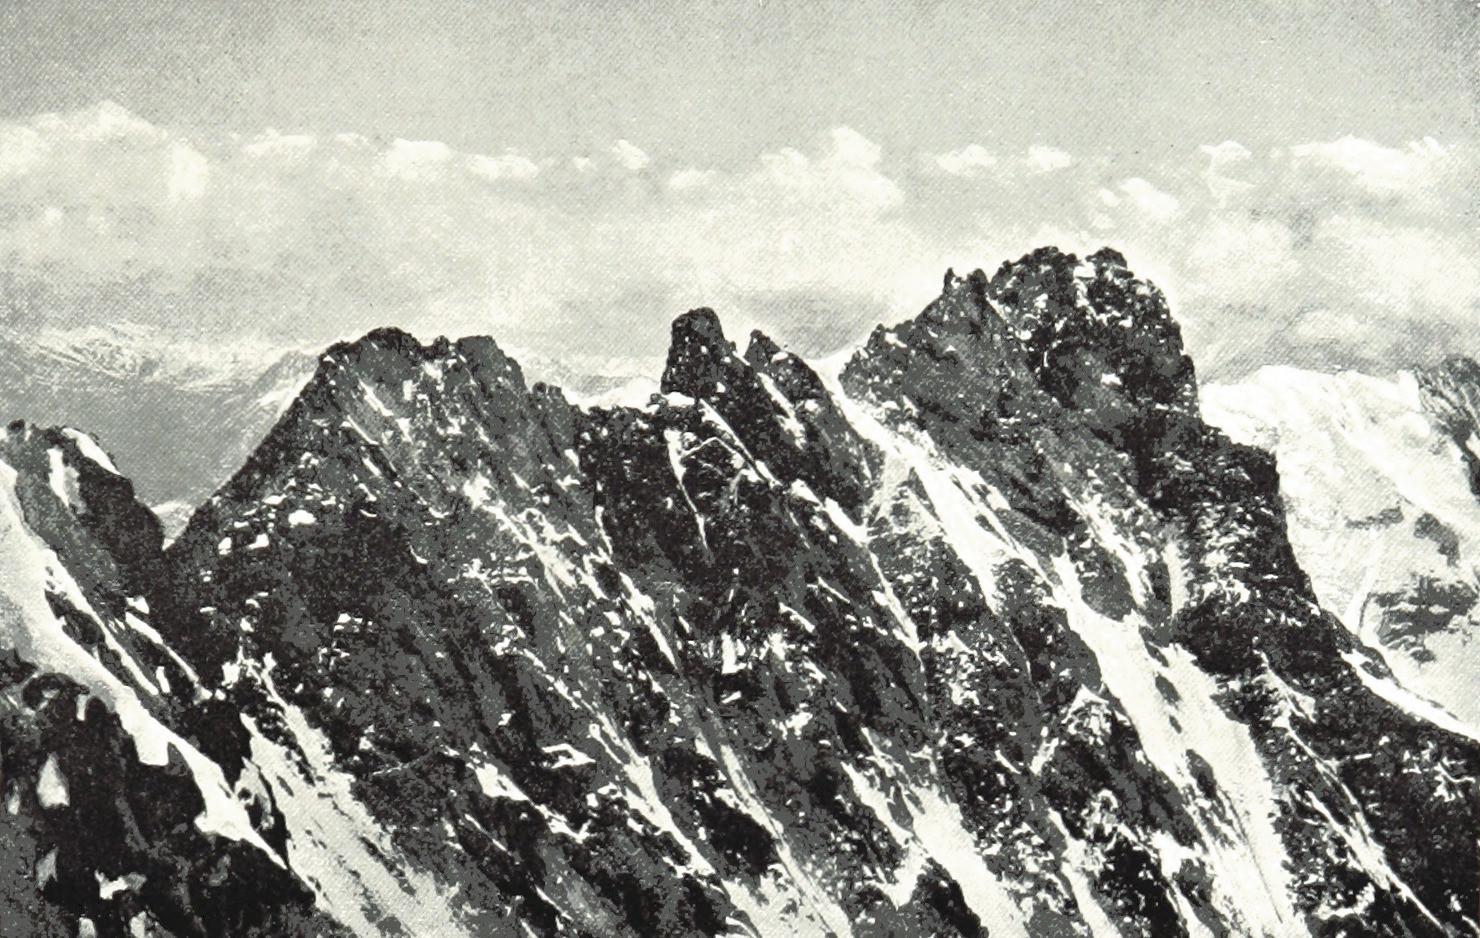 Lauteraarhorn vu du Schreckhorn par Theodor Wundt en 1898